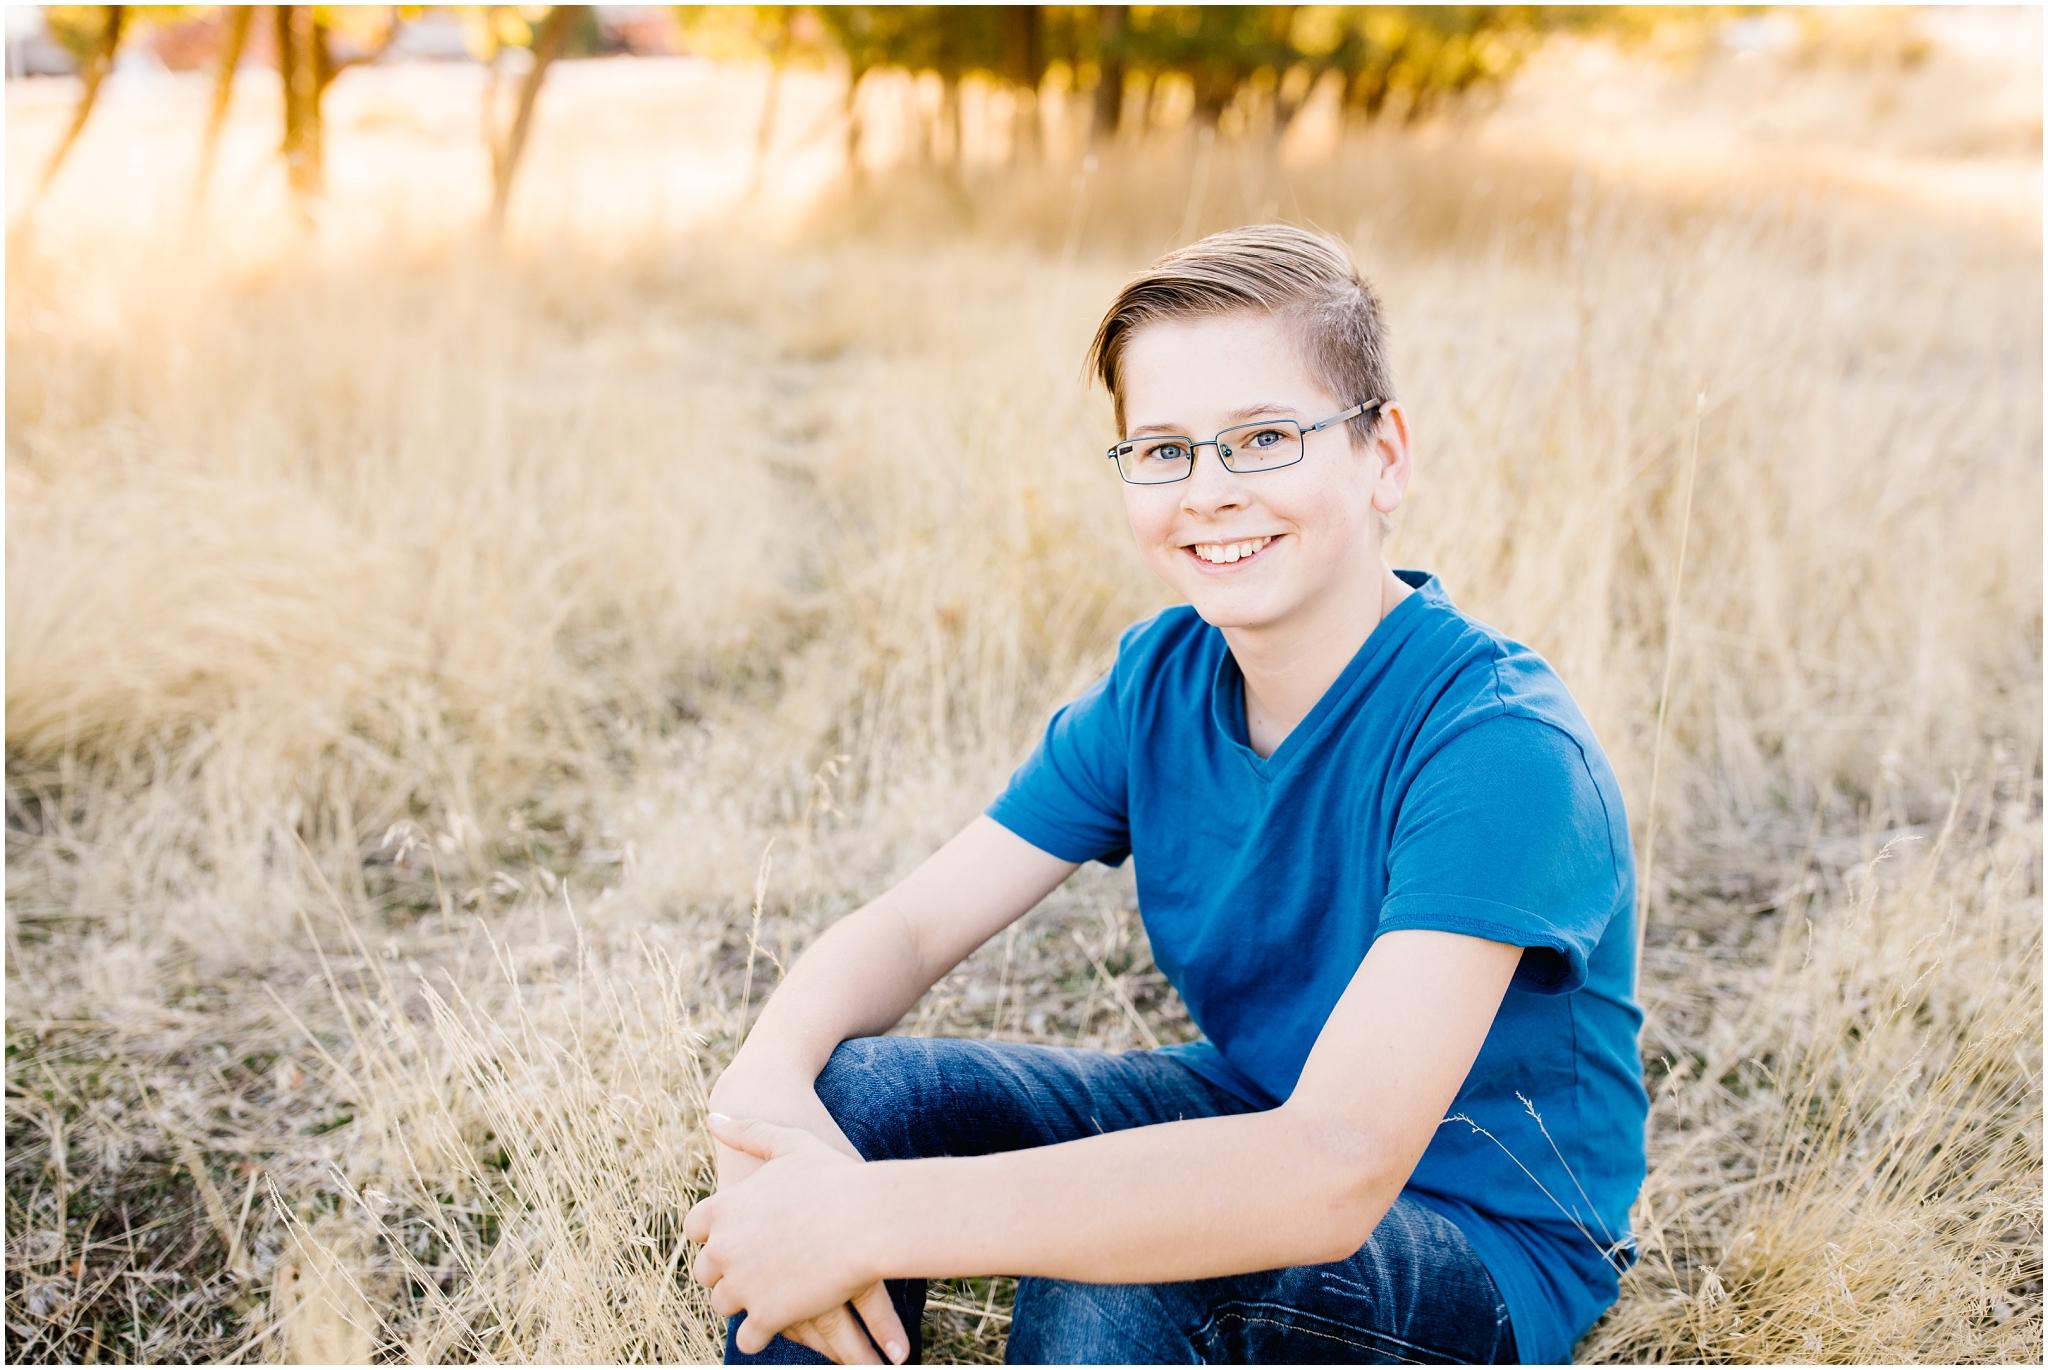 Jaursch-52_Lizzie-B-Imagery-Utah-Family-Photographer-Salt-Lake-City-Park-City-Herriman-Utah-County.jpg